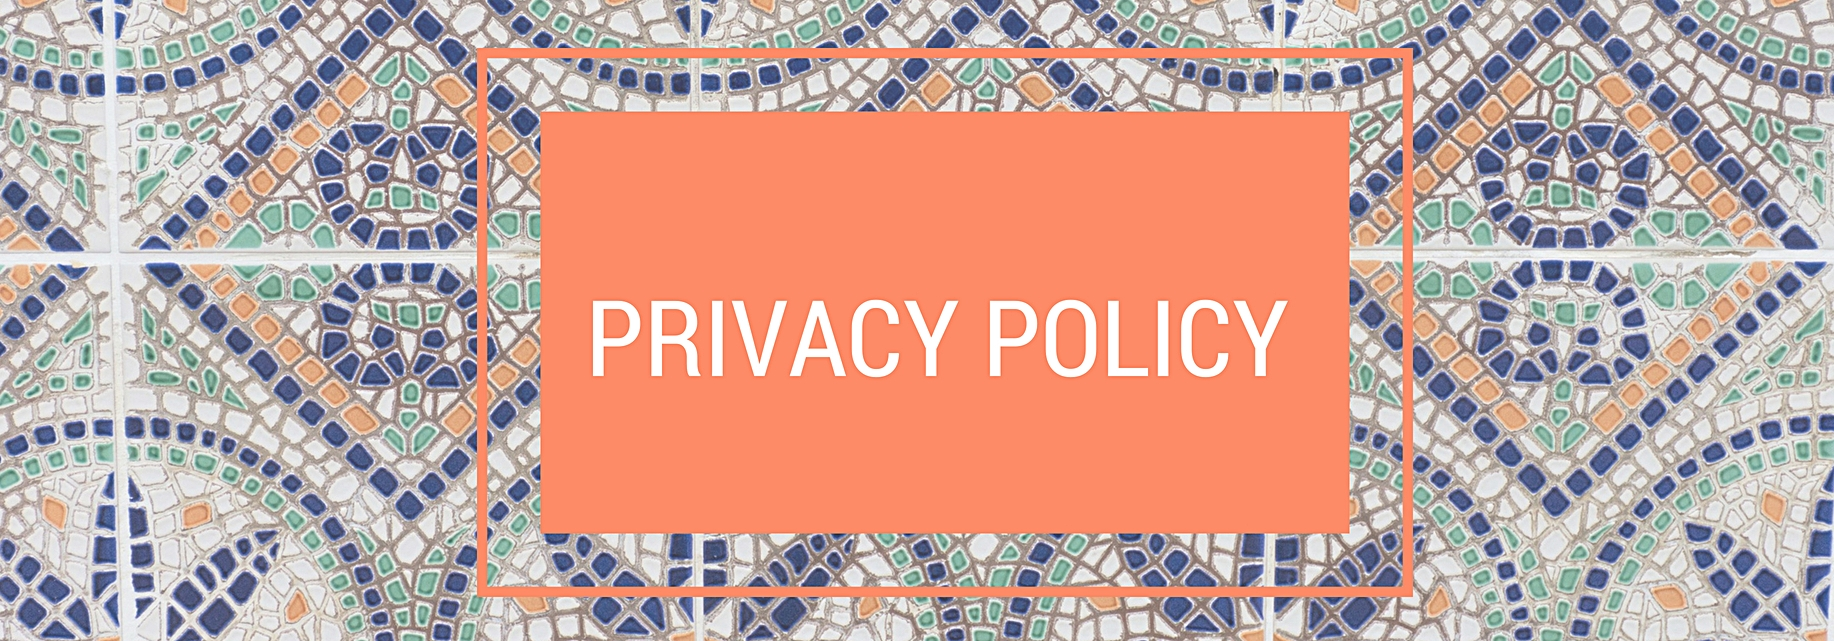 PRIVACY POLICY FOR MARISSASTAUFFERREALTOR.COM